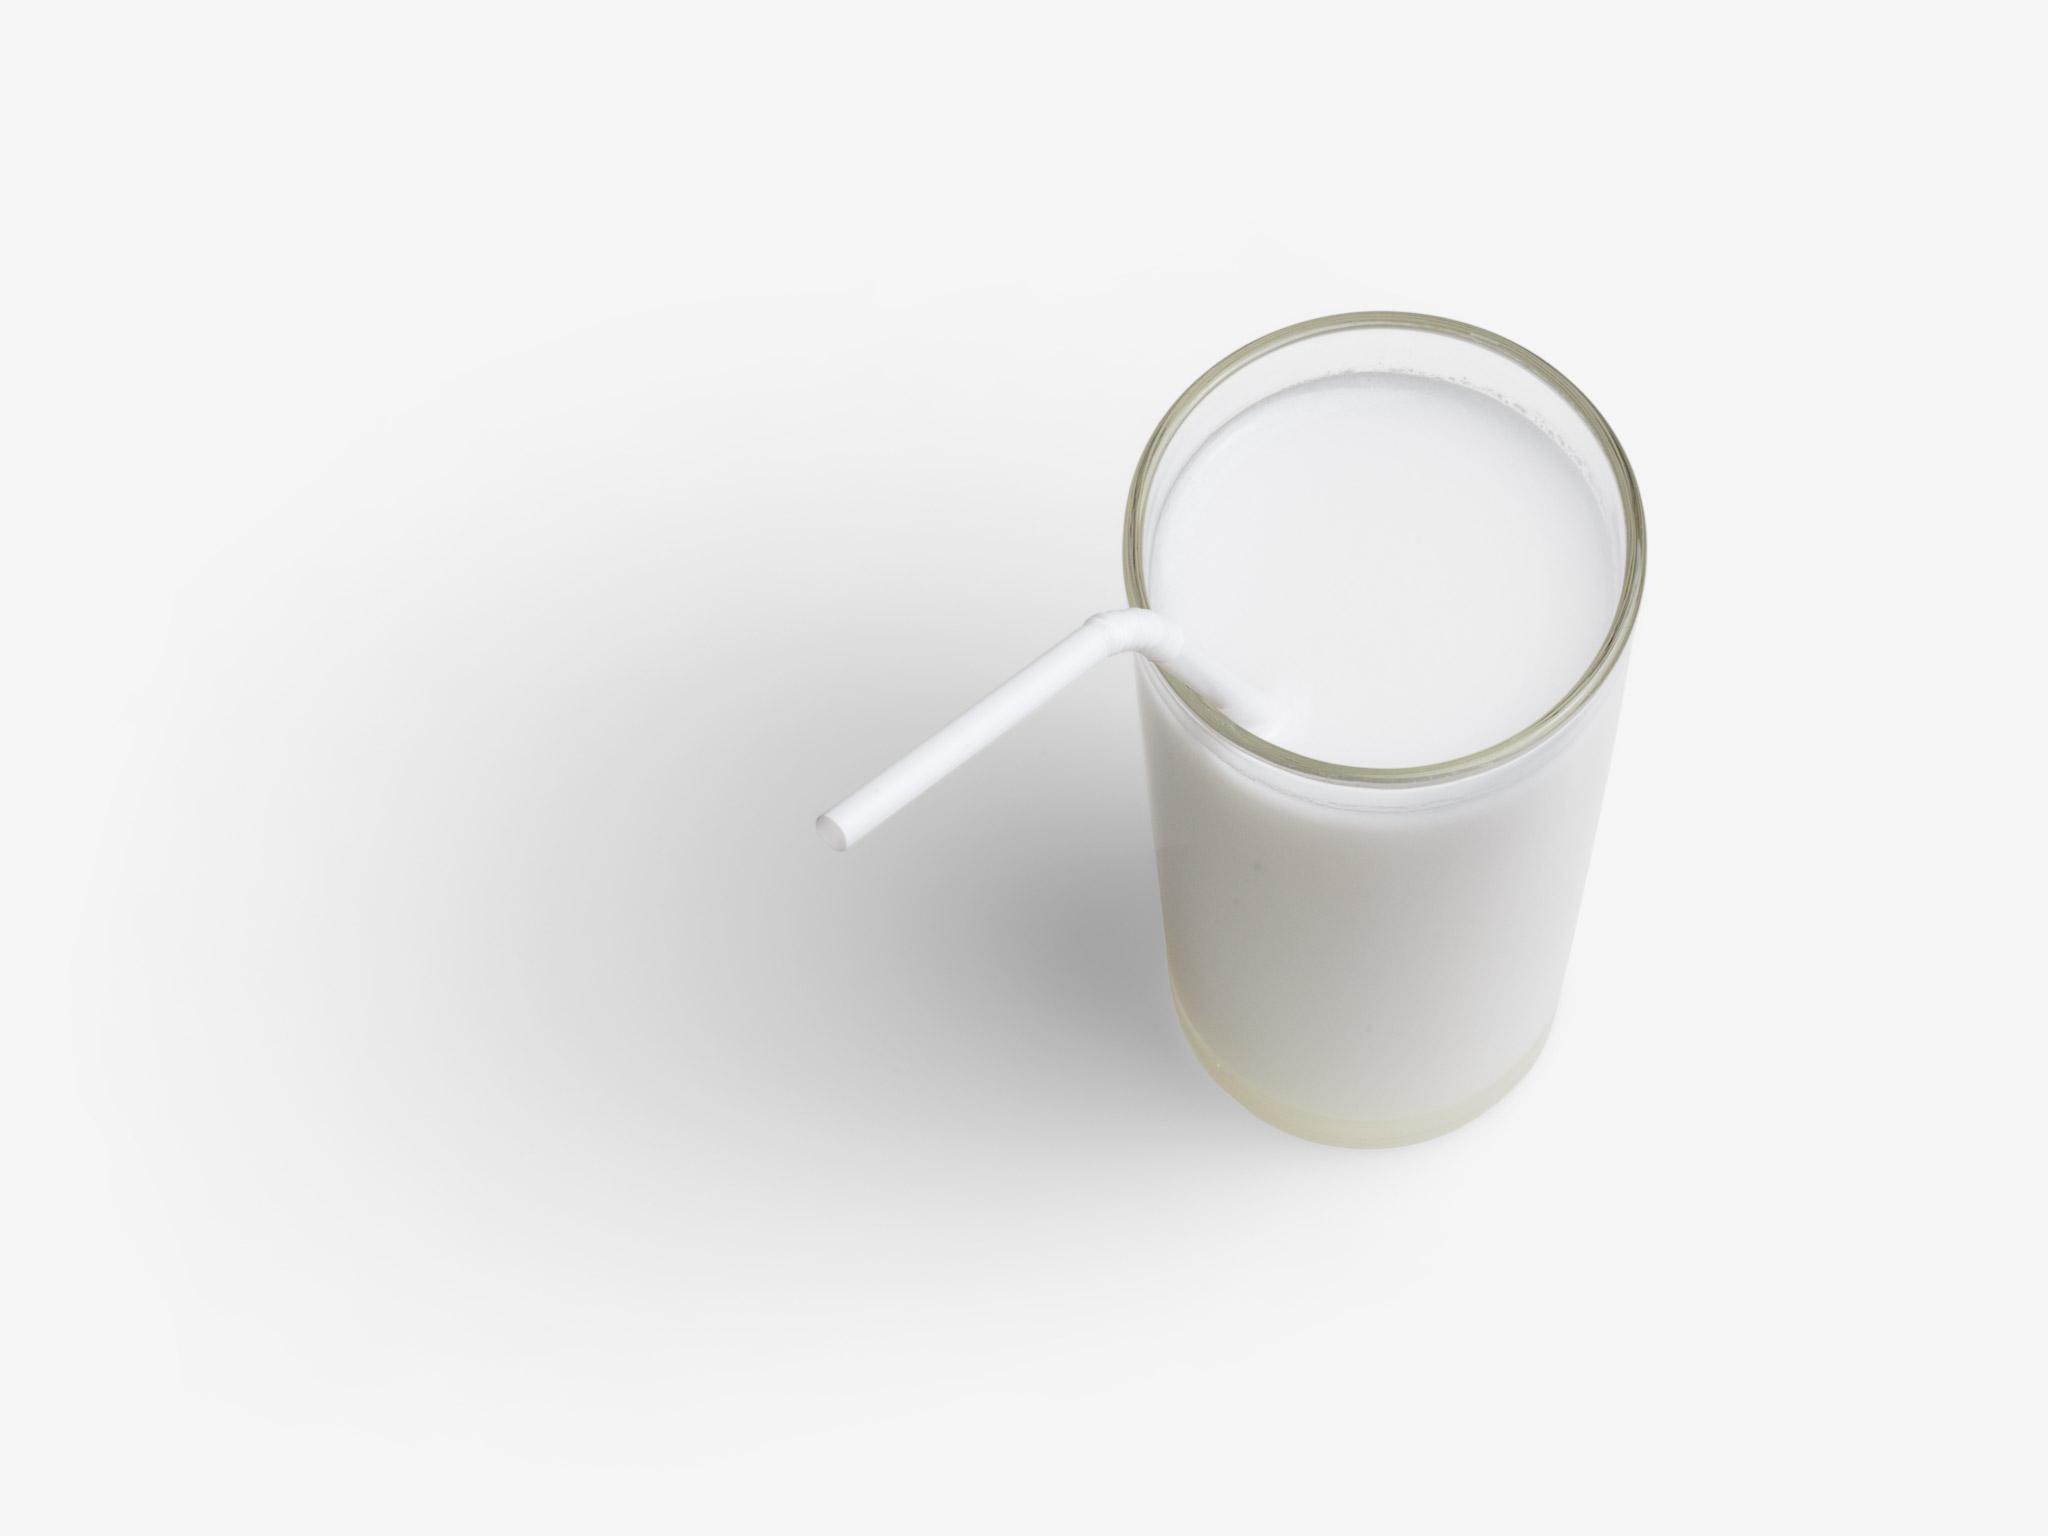 Coconut milk PSD layered image